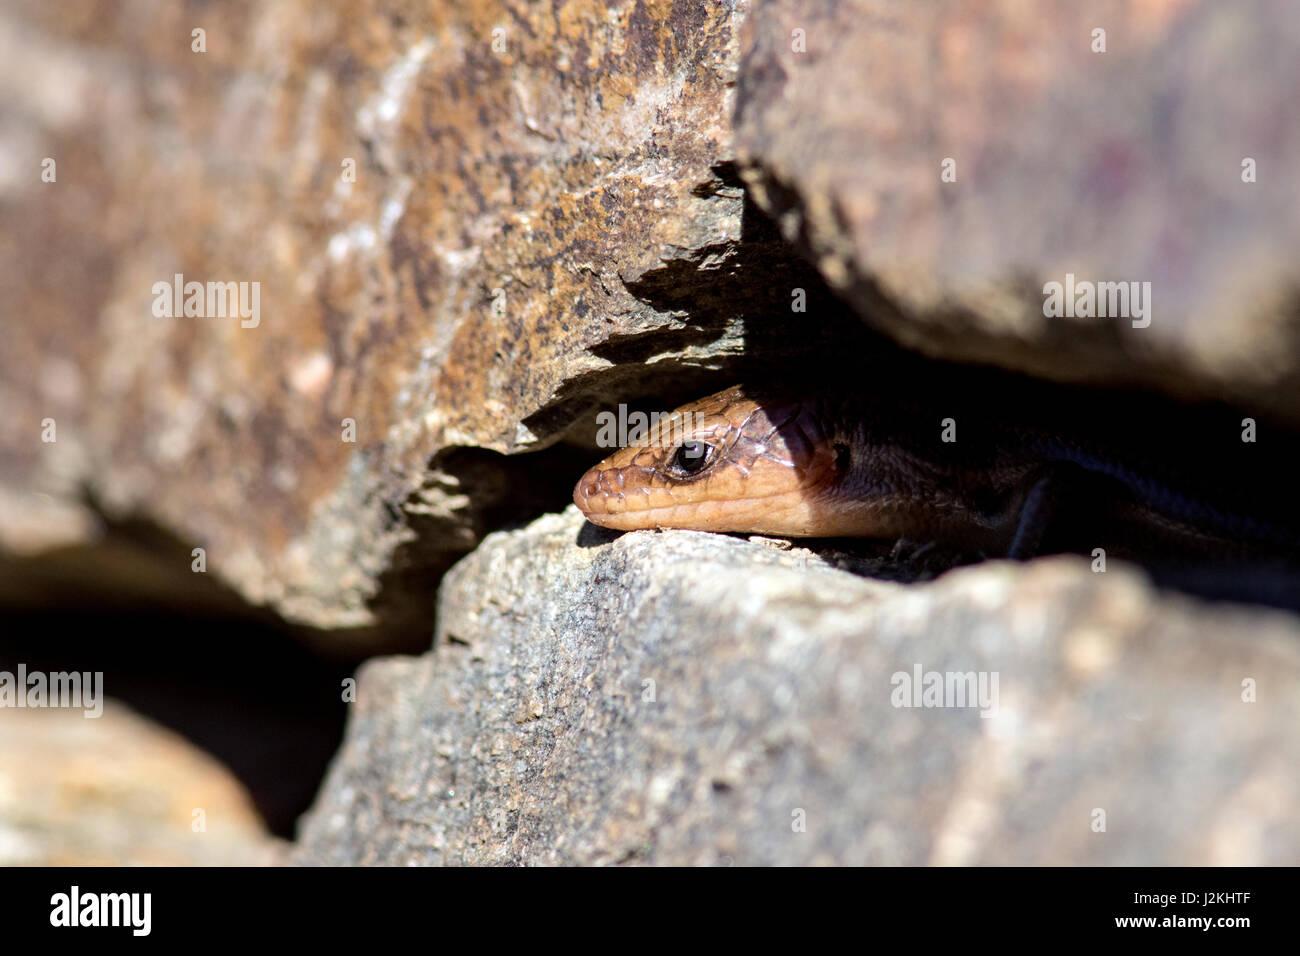 Five-lined Skink (Plestiodon fasciatus) - North Carolina Arboretum, Asheville, North Carolina, USA - Stock Image